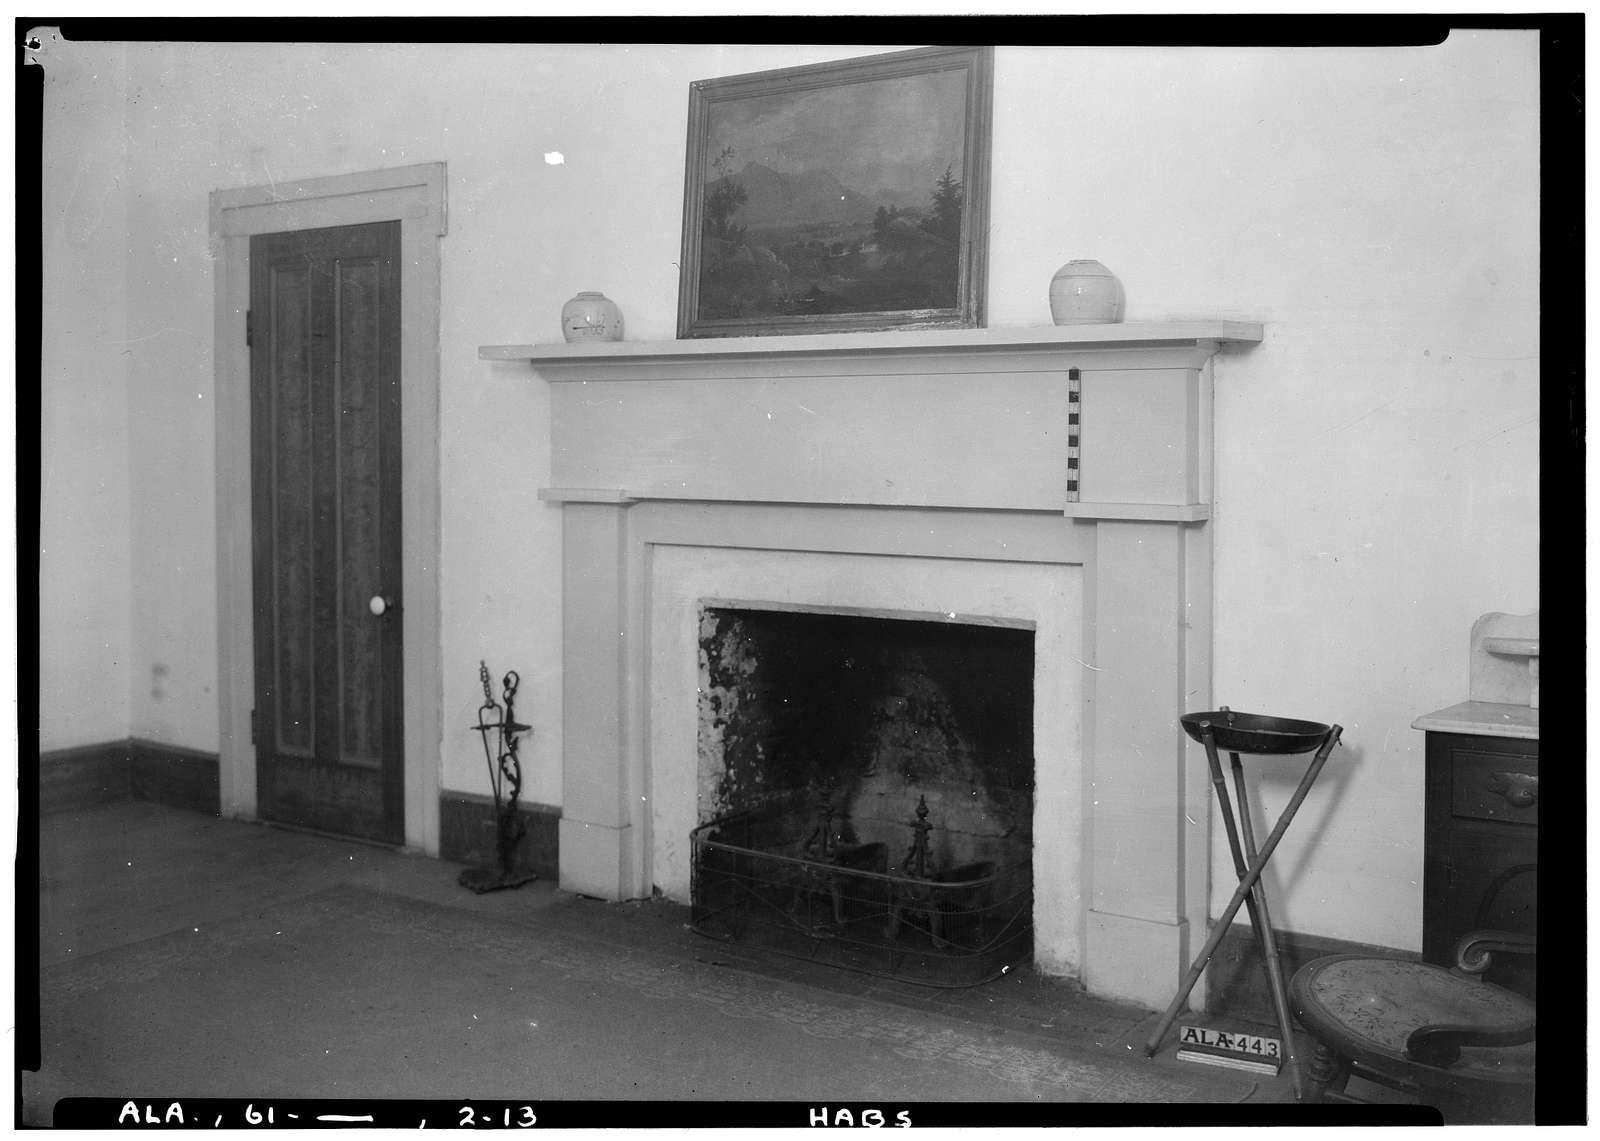 Lawler House, County Road 11, Talladega, Talladega County, AL